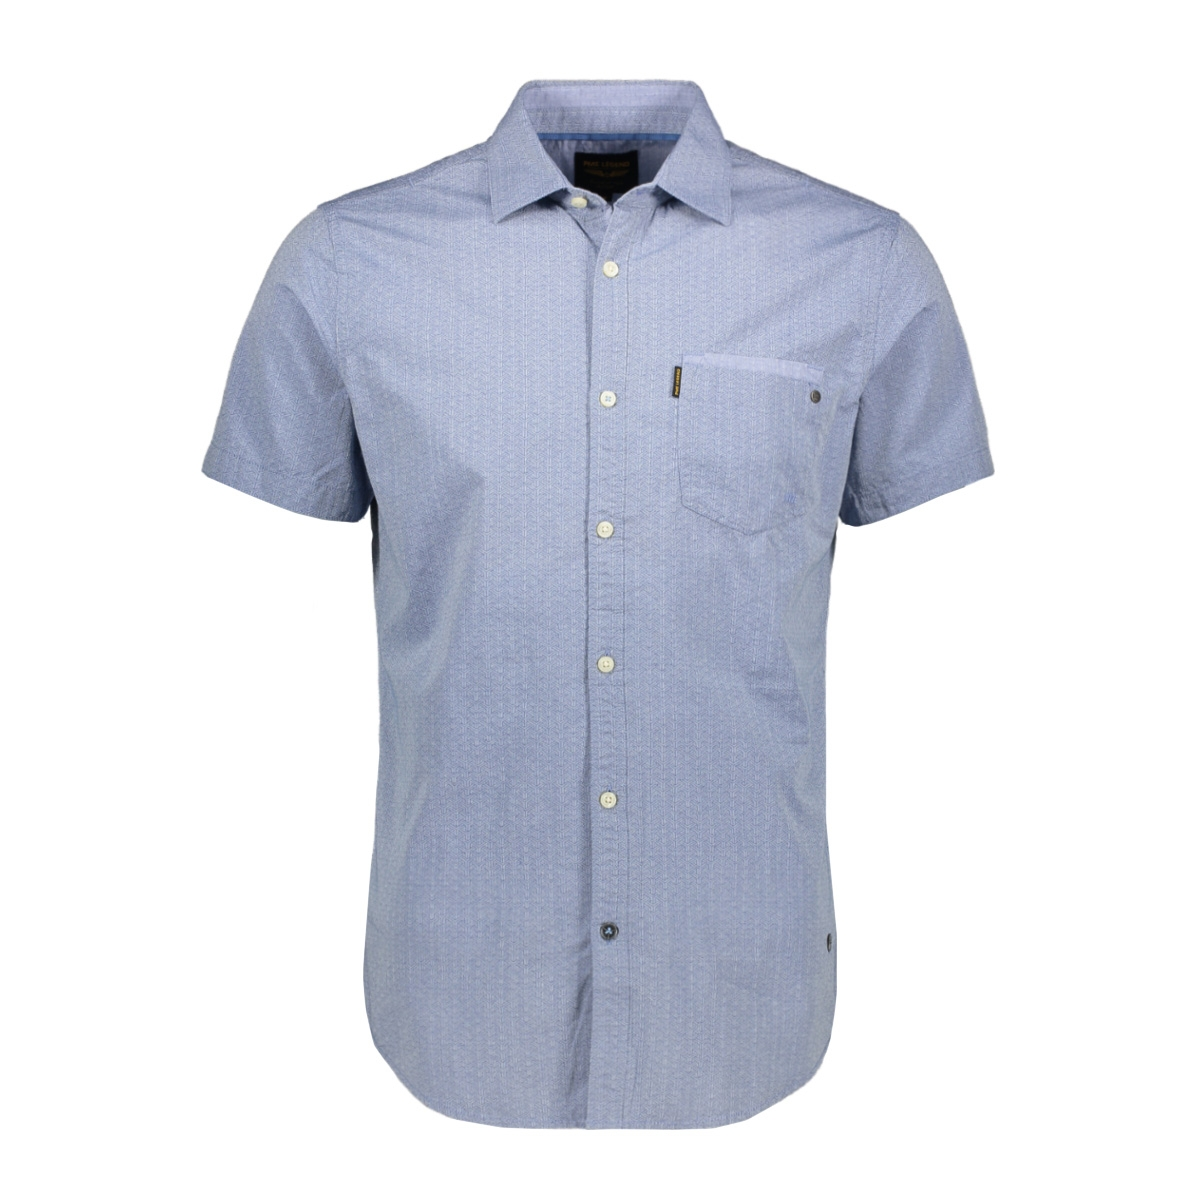 short sleeve shirt psis192229 pme legend overhemd 547